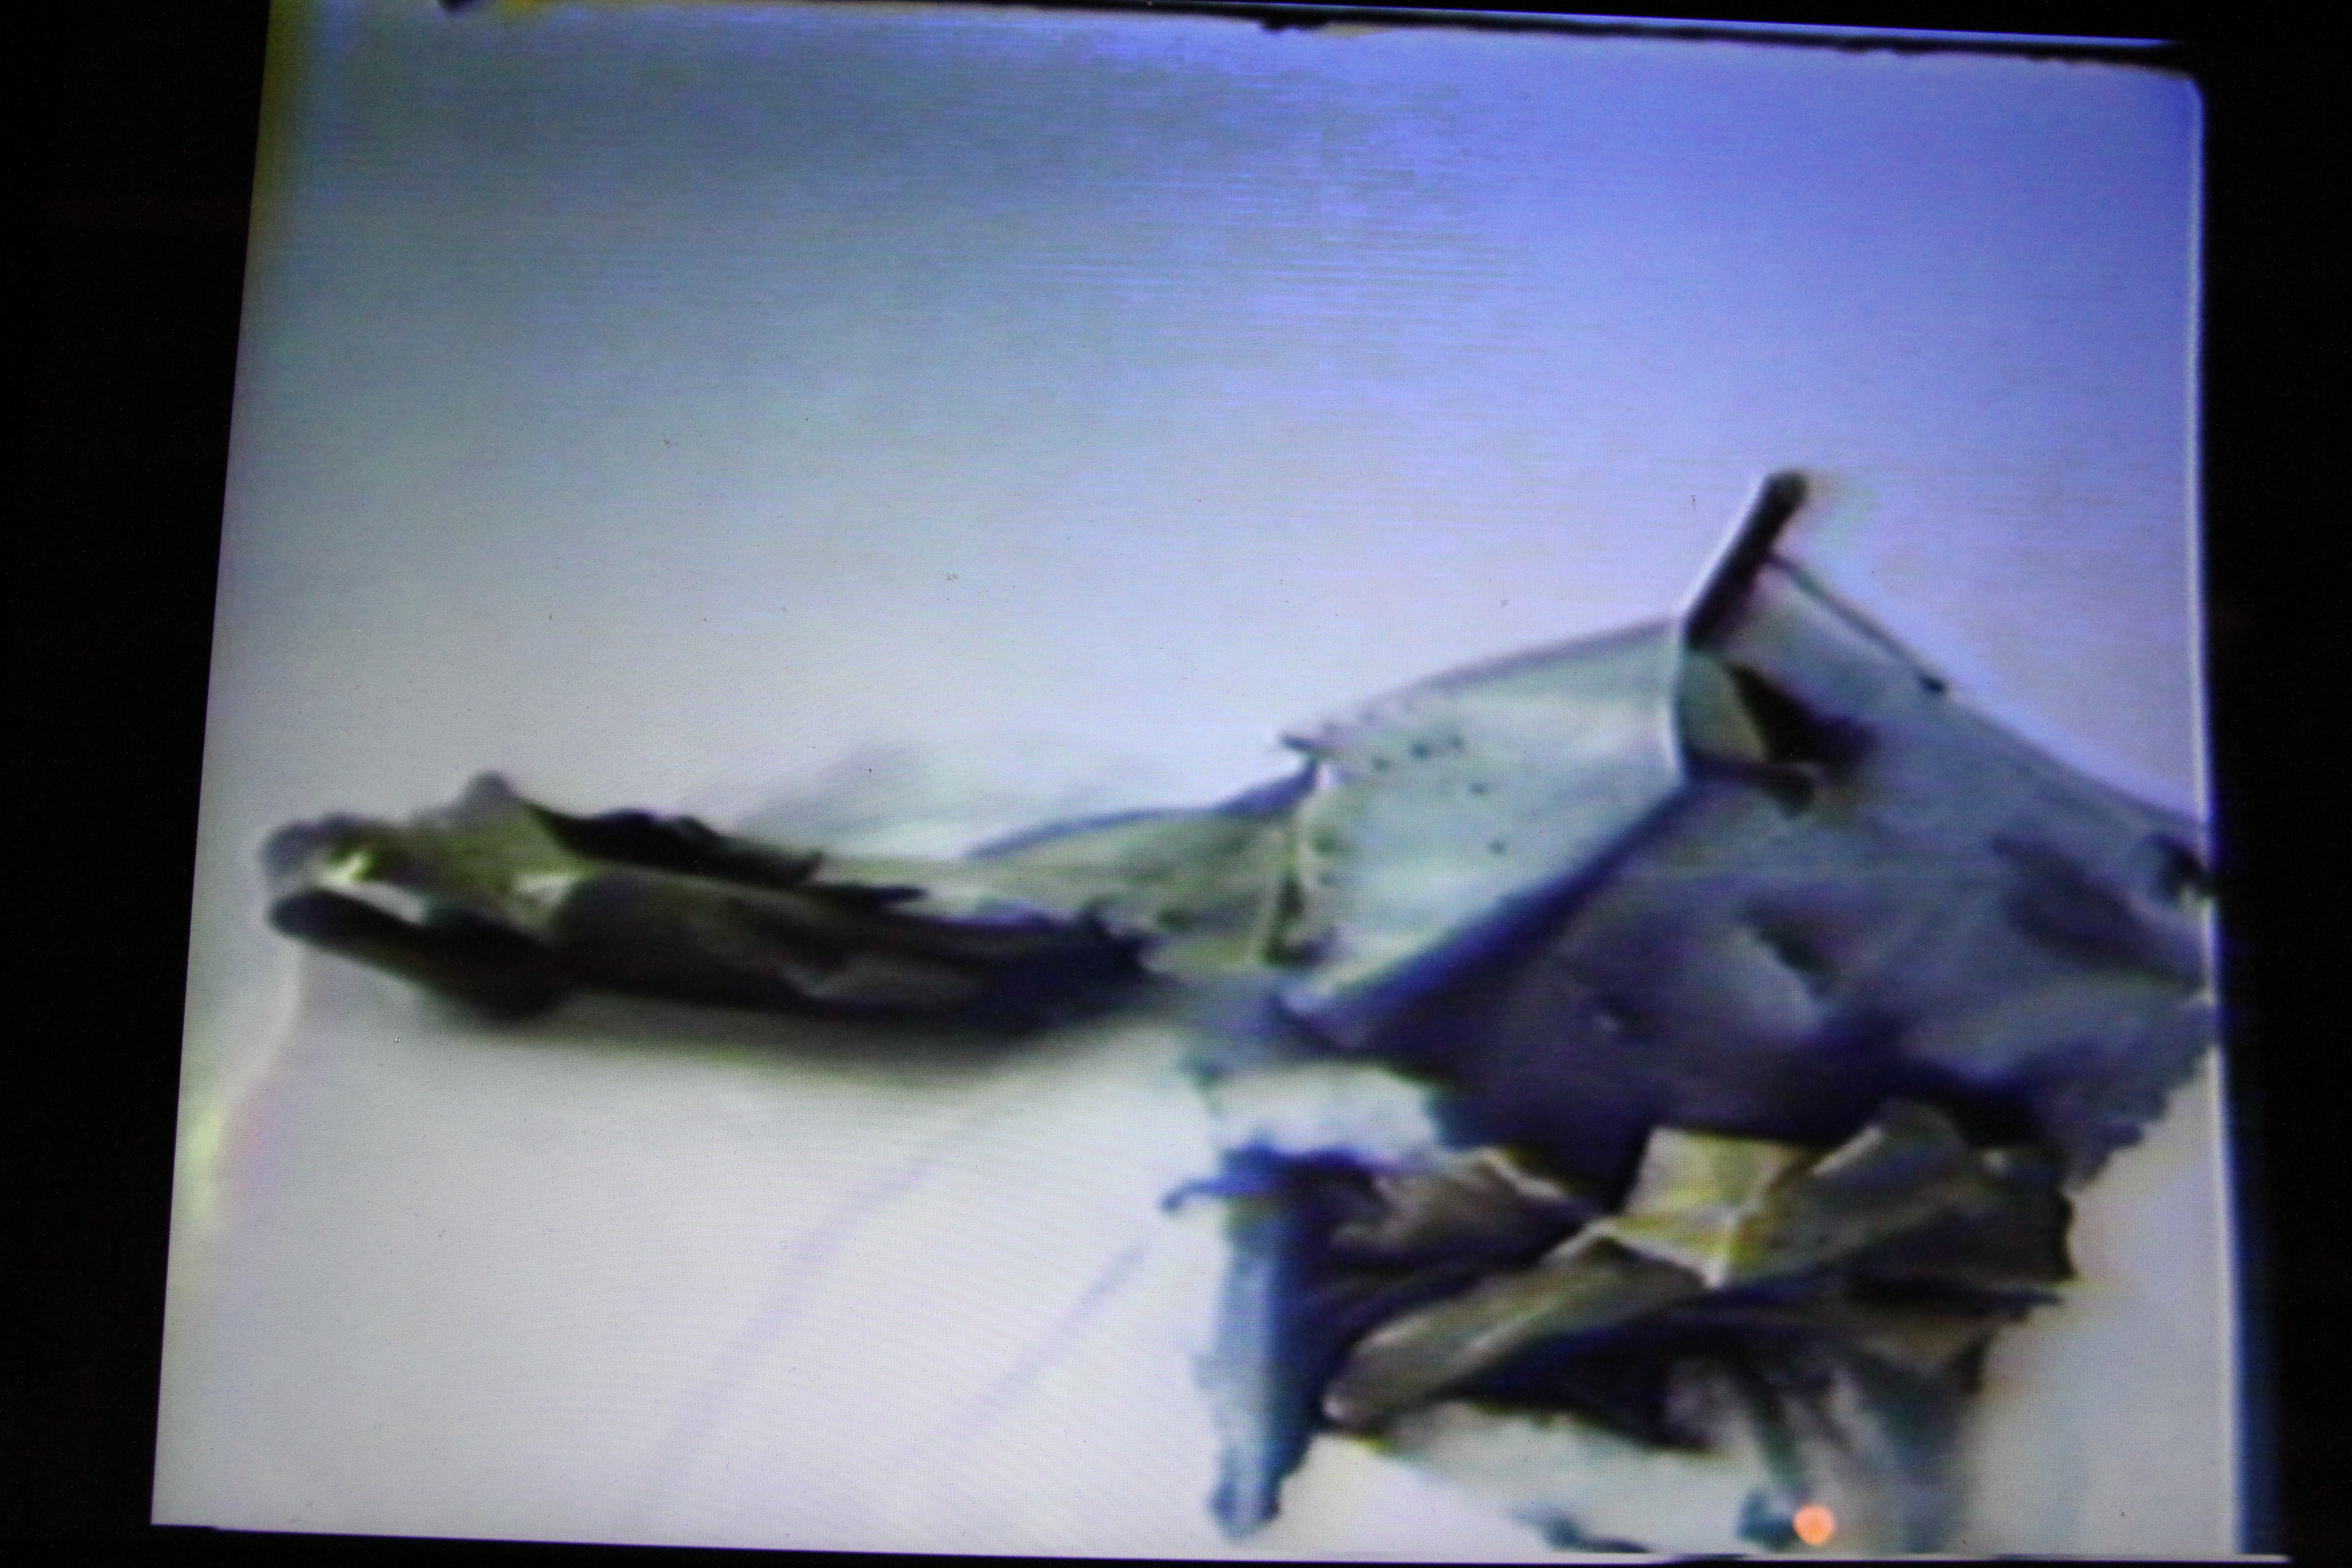 4 EAL 980 More Wreckage